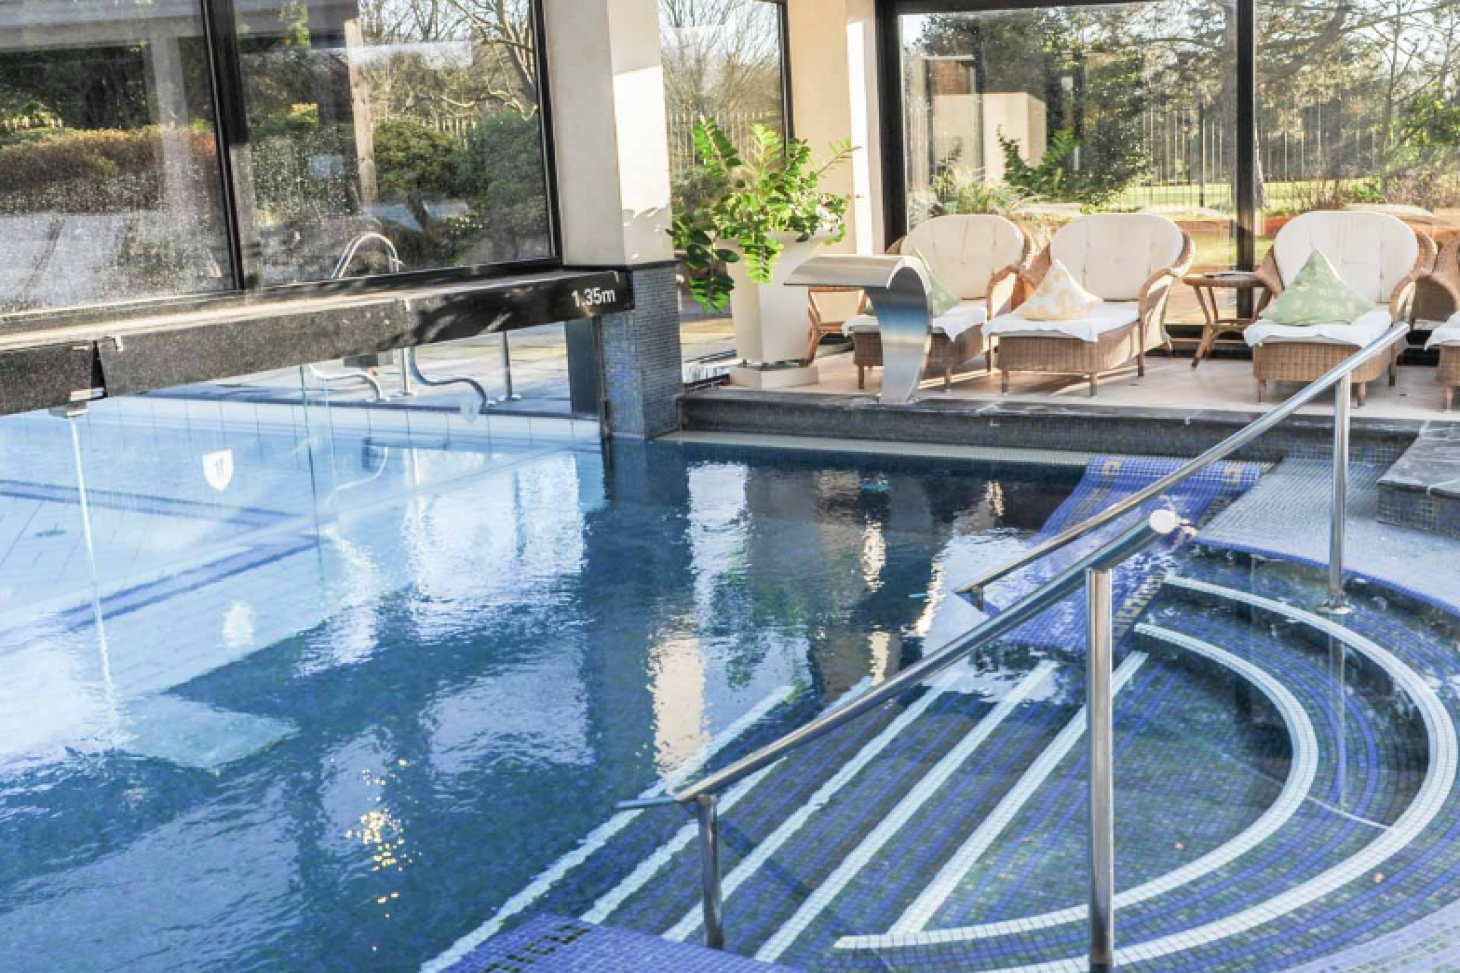 Fredricks Hotel Restaurant Spa Indoor swimming pool